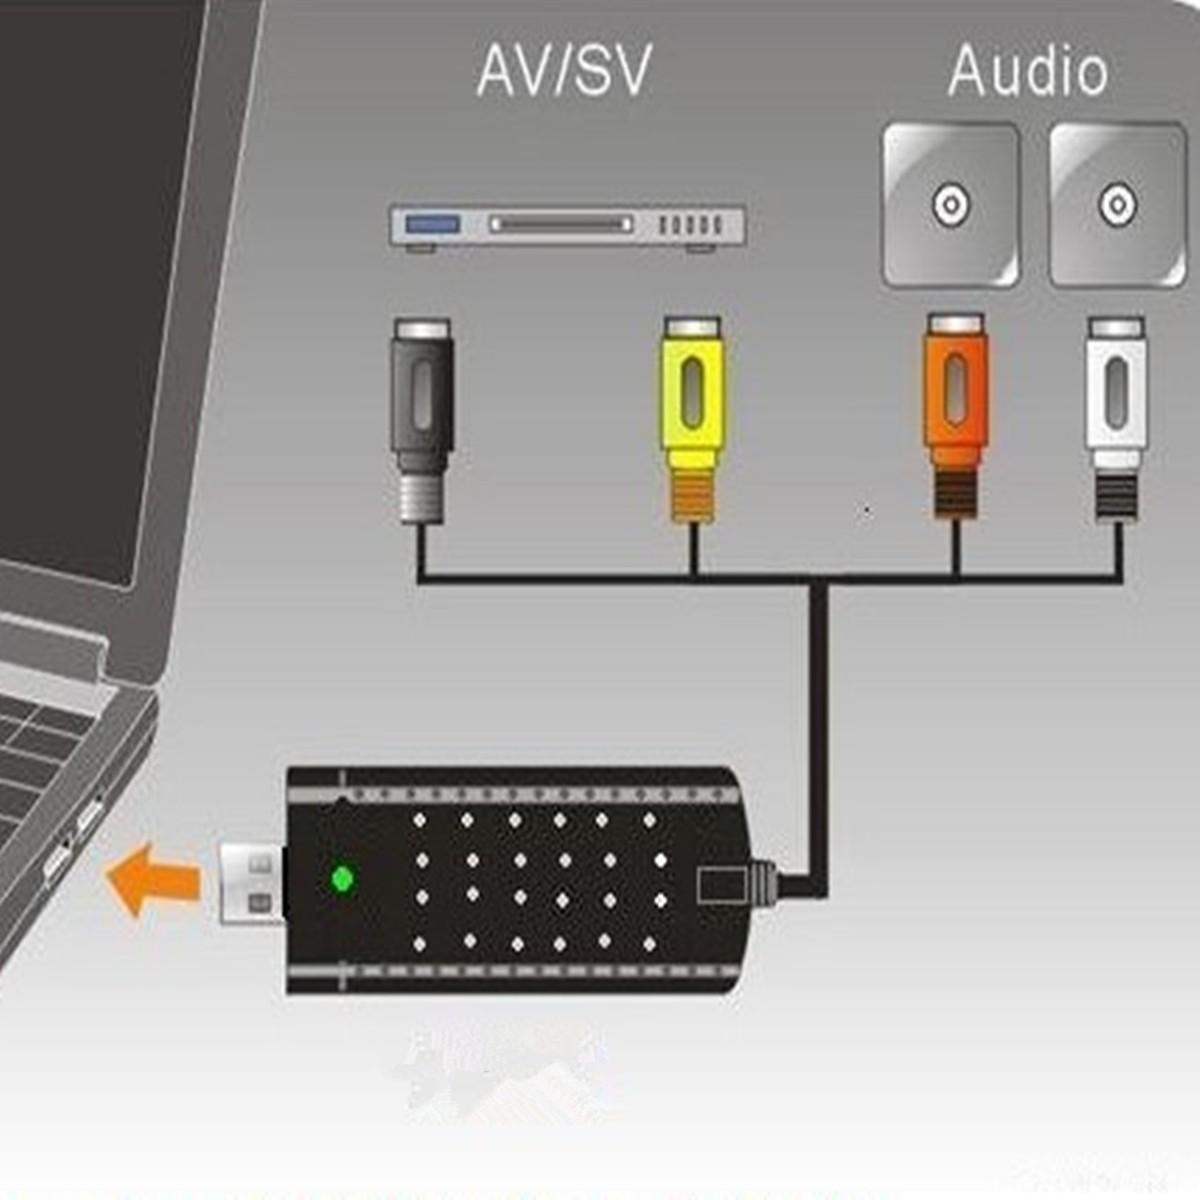 Download Tuneskit Audiobook Converter 3 0 6 12 Free On Os: New USB 2.0 Converter Audio Video Grabber Capture Adapter